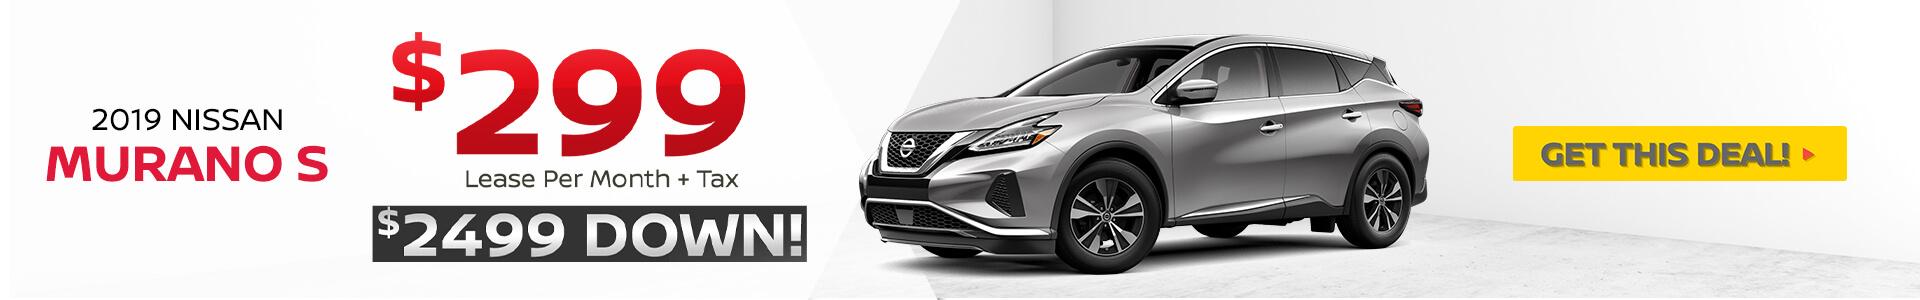 2019 Nissan Murano Lease $299